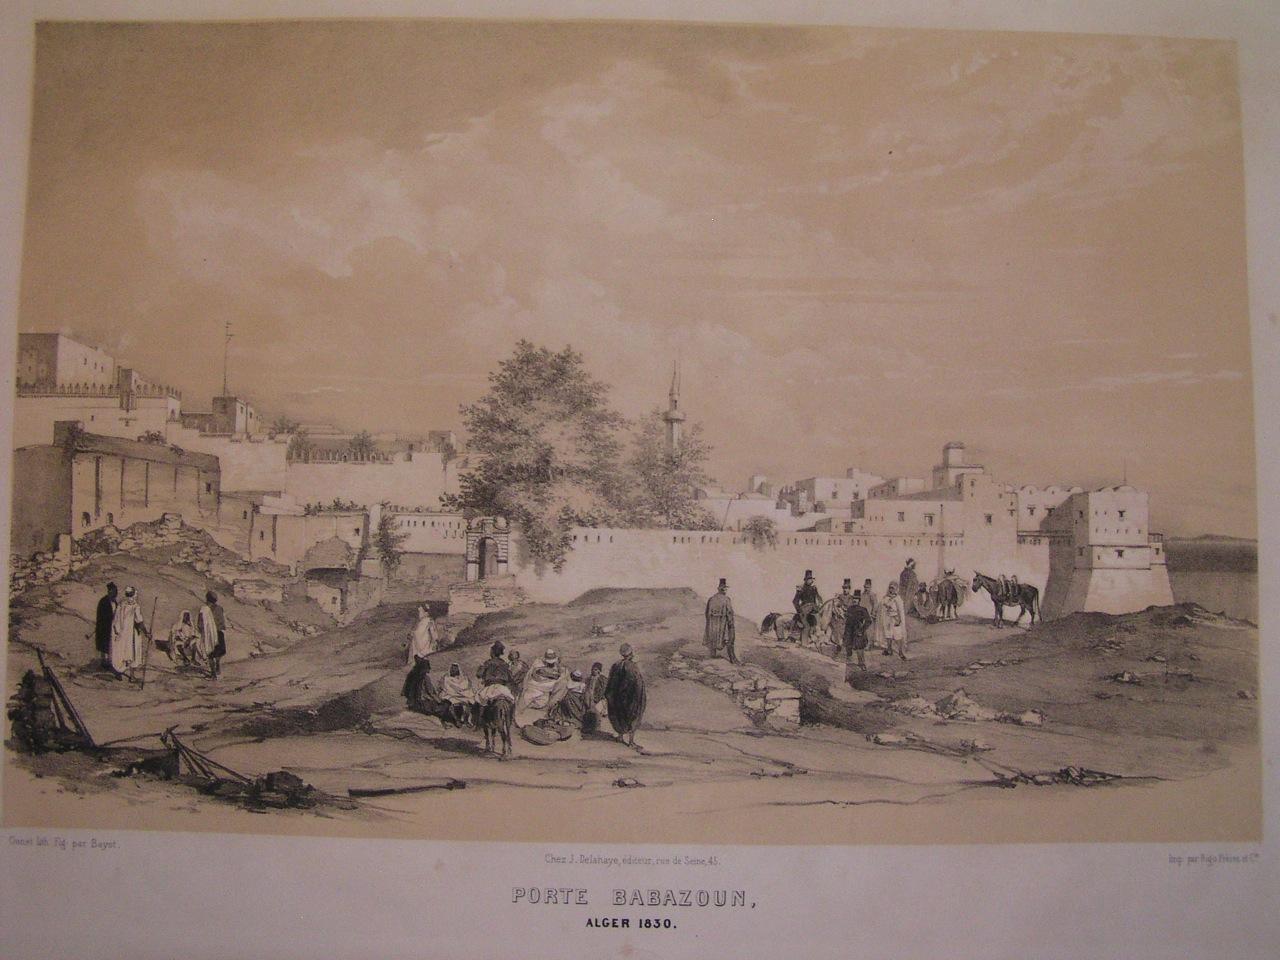 ALGERIA : PORTE BABAZOUN : North africa, algeria, orientalism, e